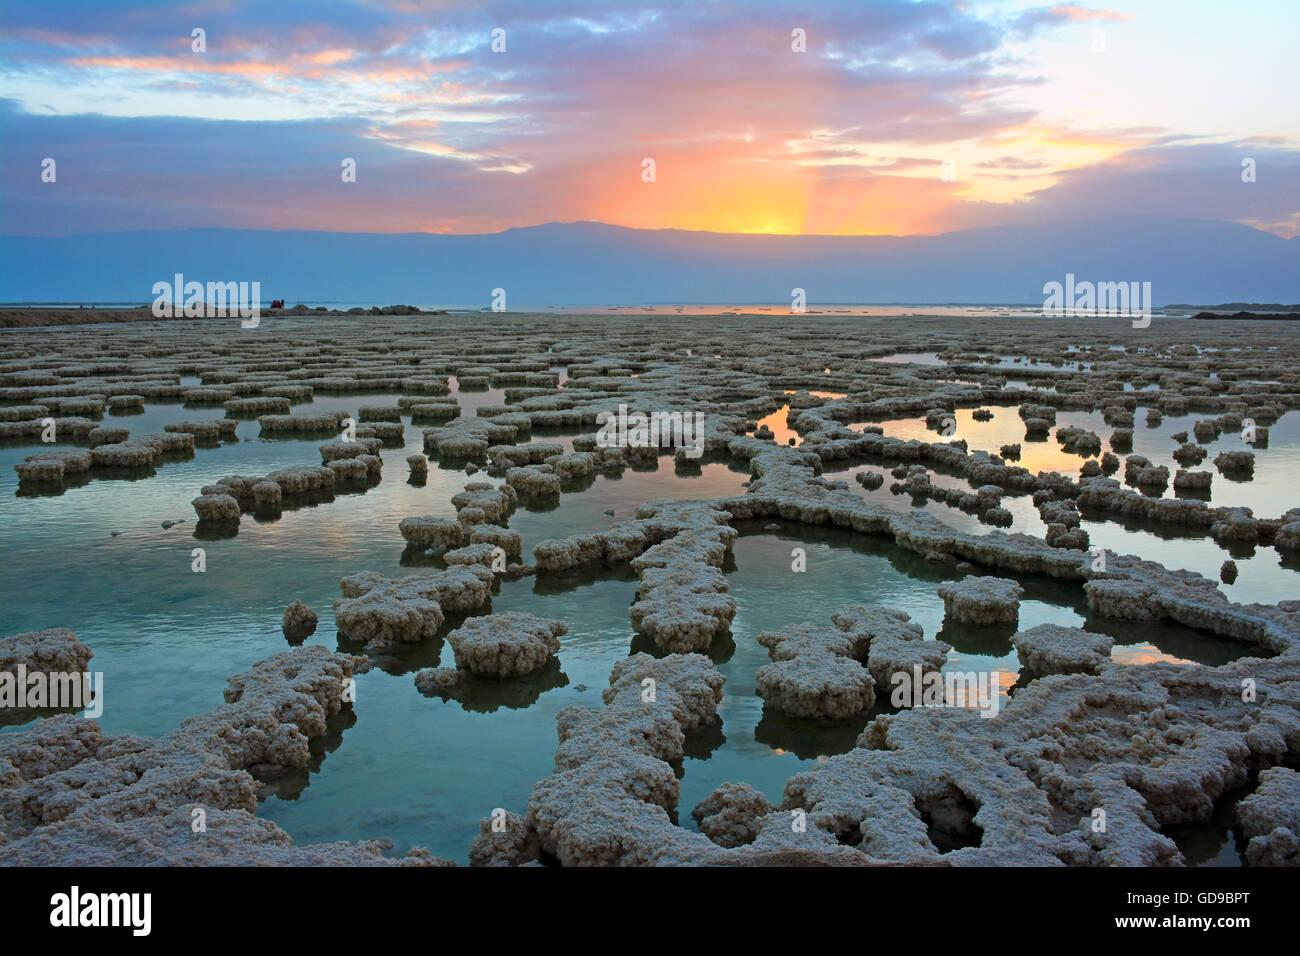 Sonnenaufgang über Salzbildung im Toten Meer, Israel Stockbild